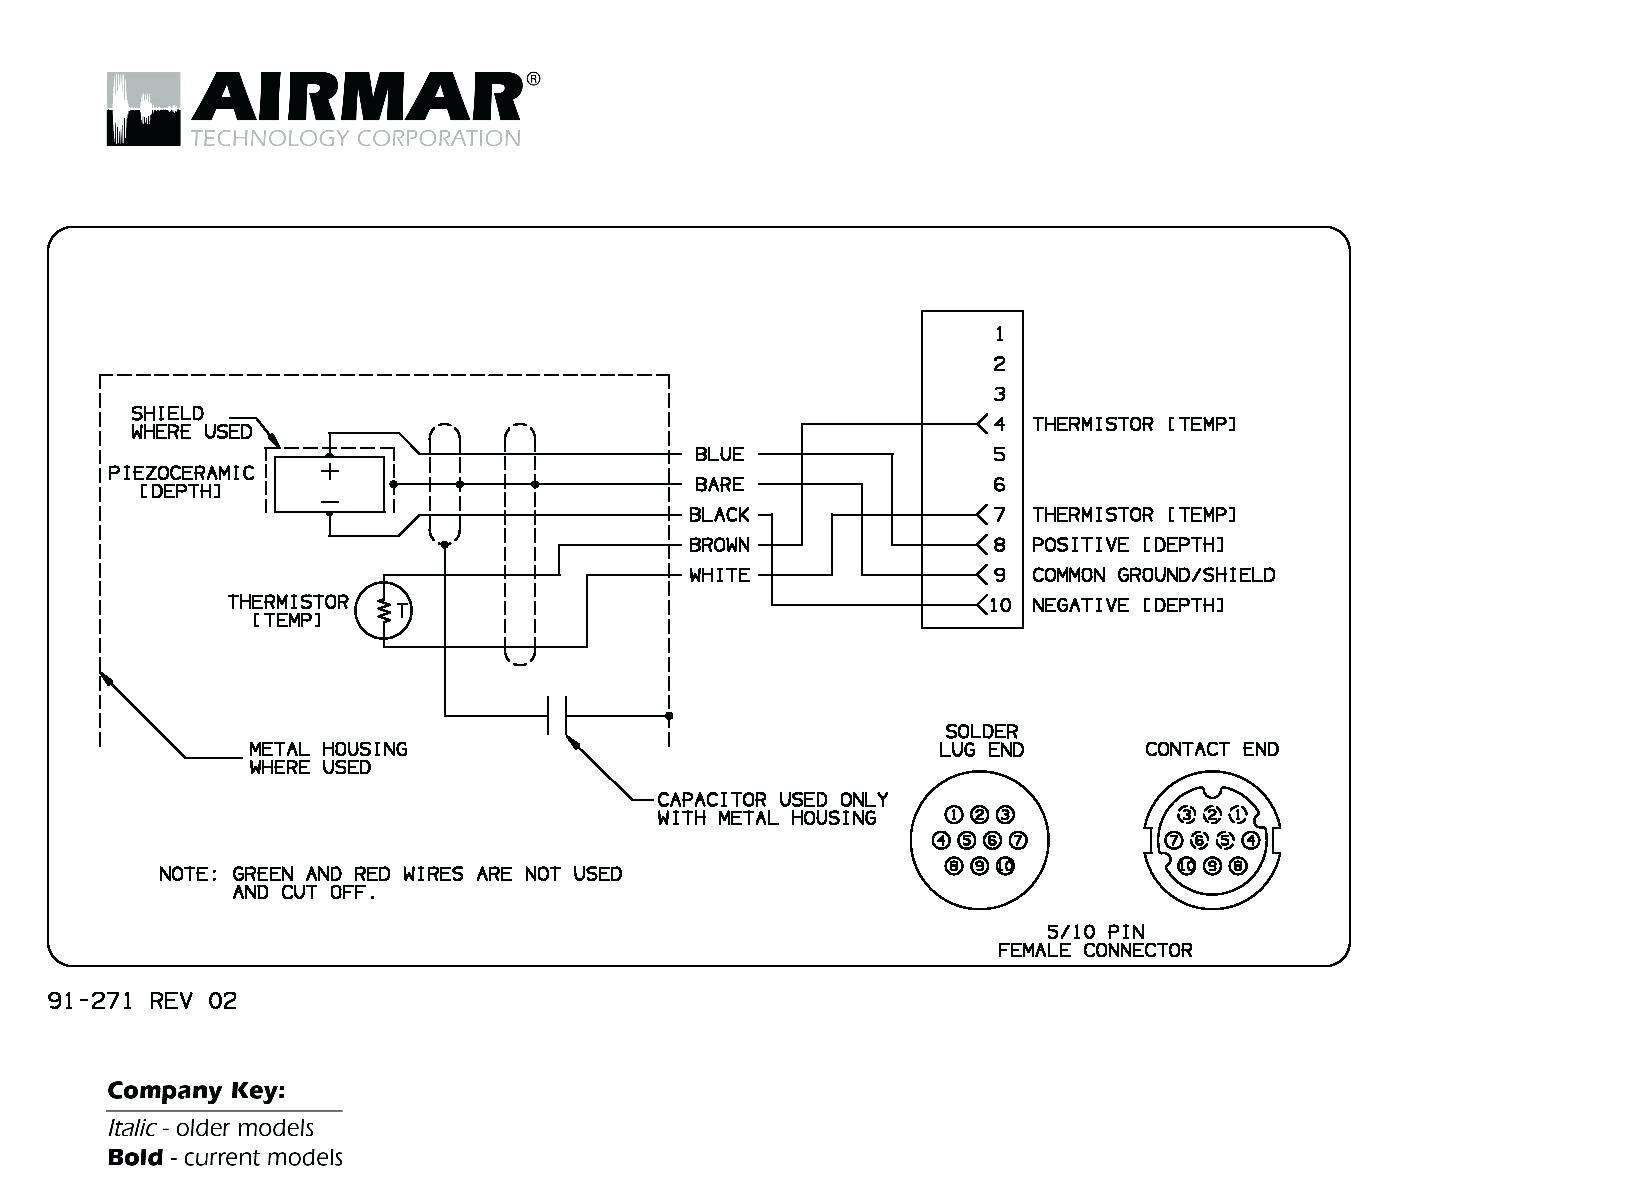 Garmin Transducer Wiring Diagram Garmin Gps Antenna Wiring Diagram Symbols Motor Avionics List Of Garmin Transducer Wiring Diagram